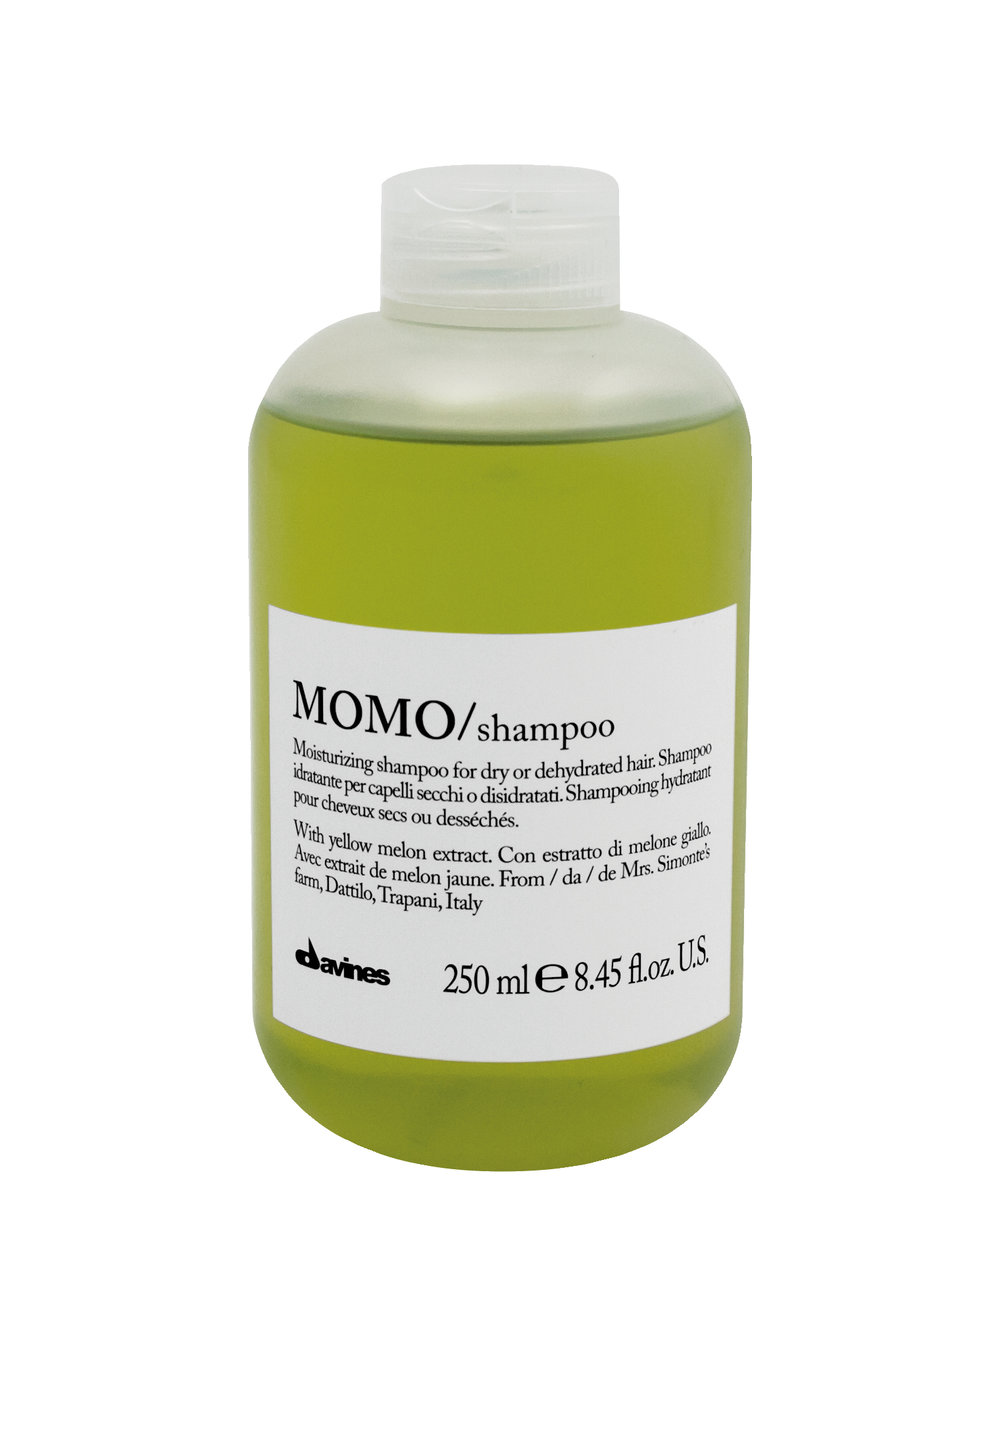 ech momo shampoo.jpg